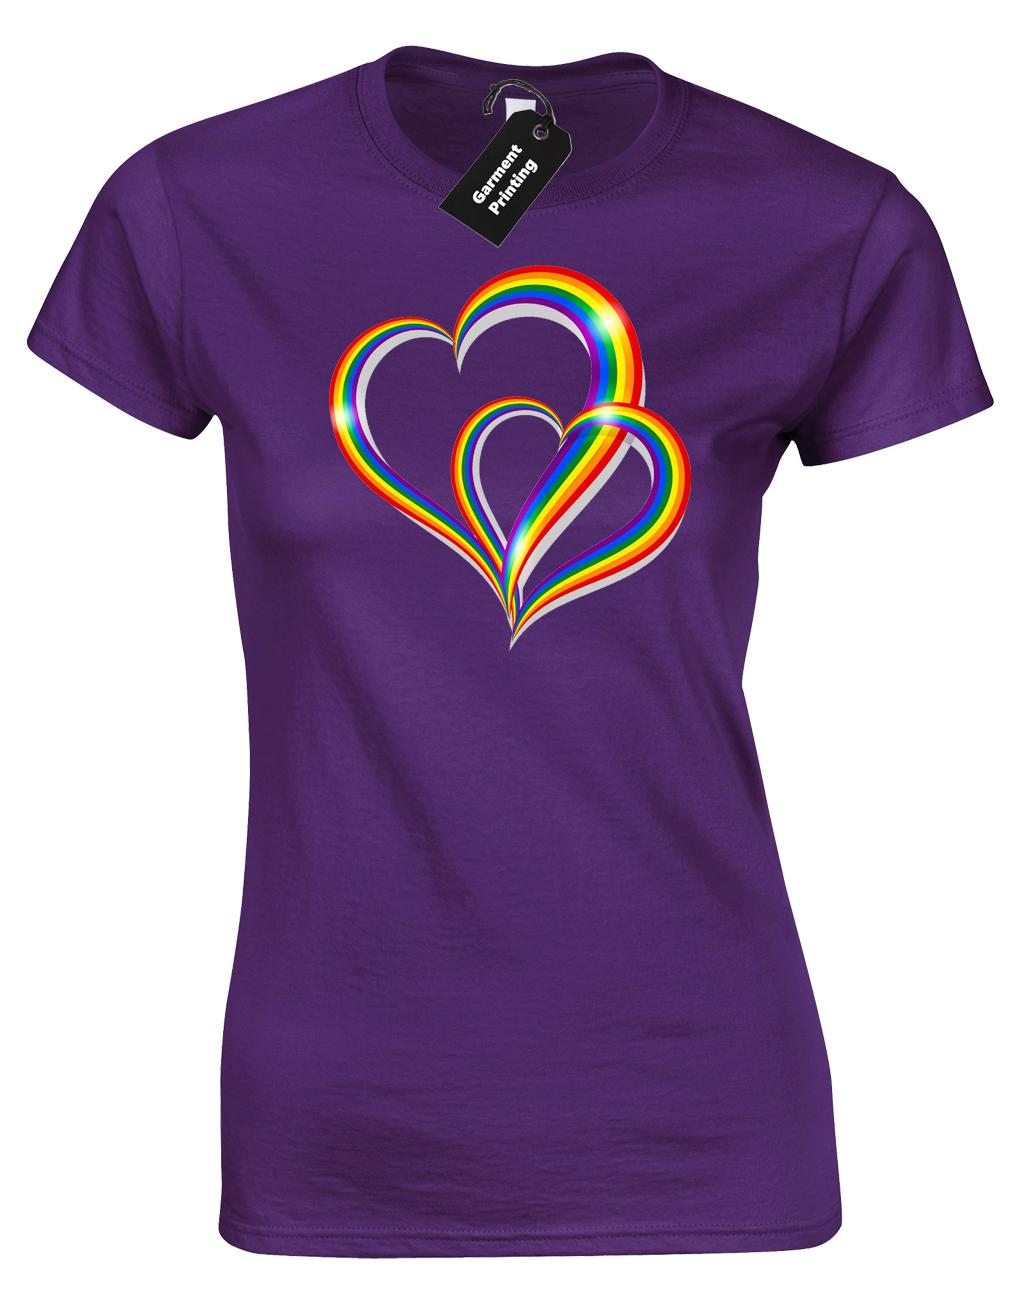 2 Pride Hearts Ladies T-Shirt Gay Lesbian Lgbt Unisex Rainbow Womens Top ( Col) 8